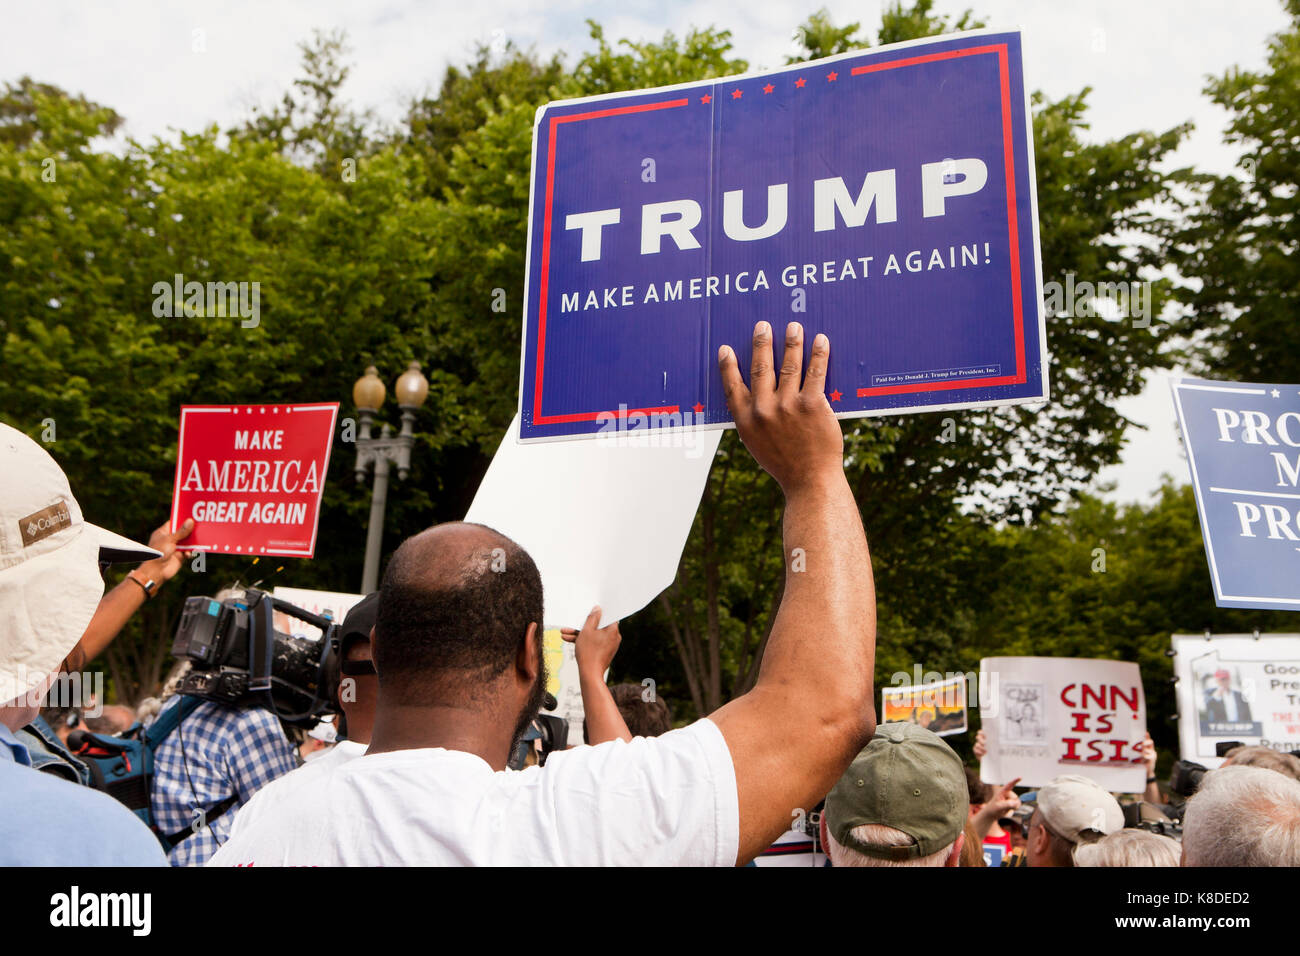 Trump supporter at a pro-Trump rally - Washington, DC USA - Stock Image